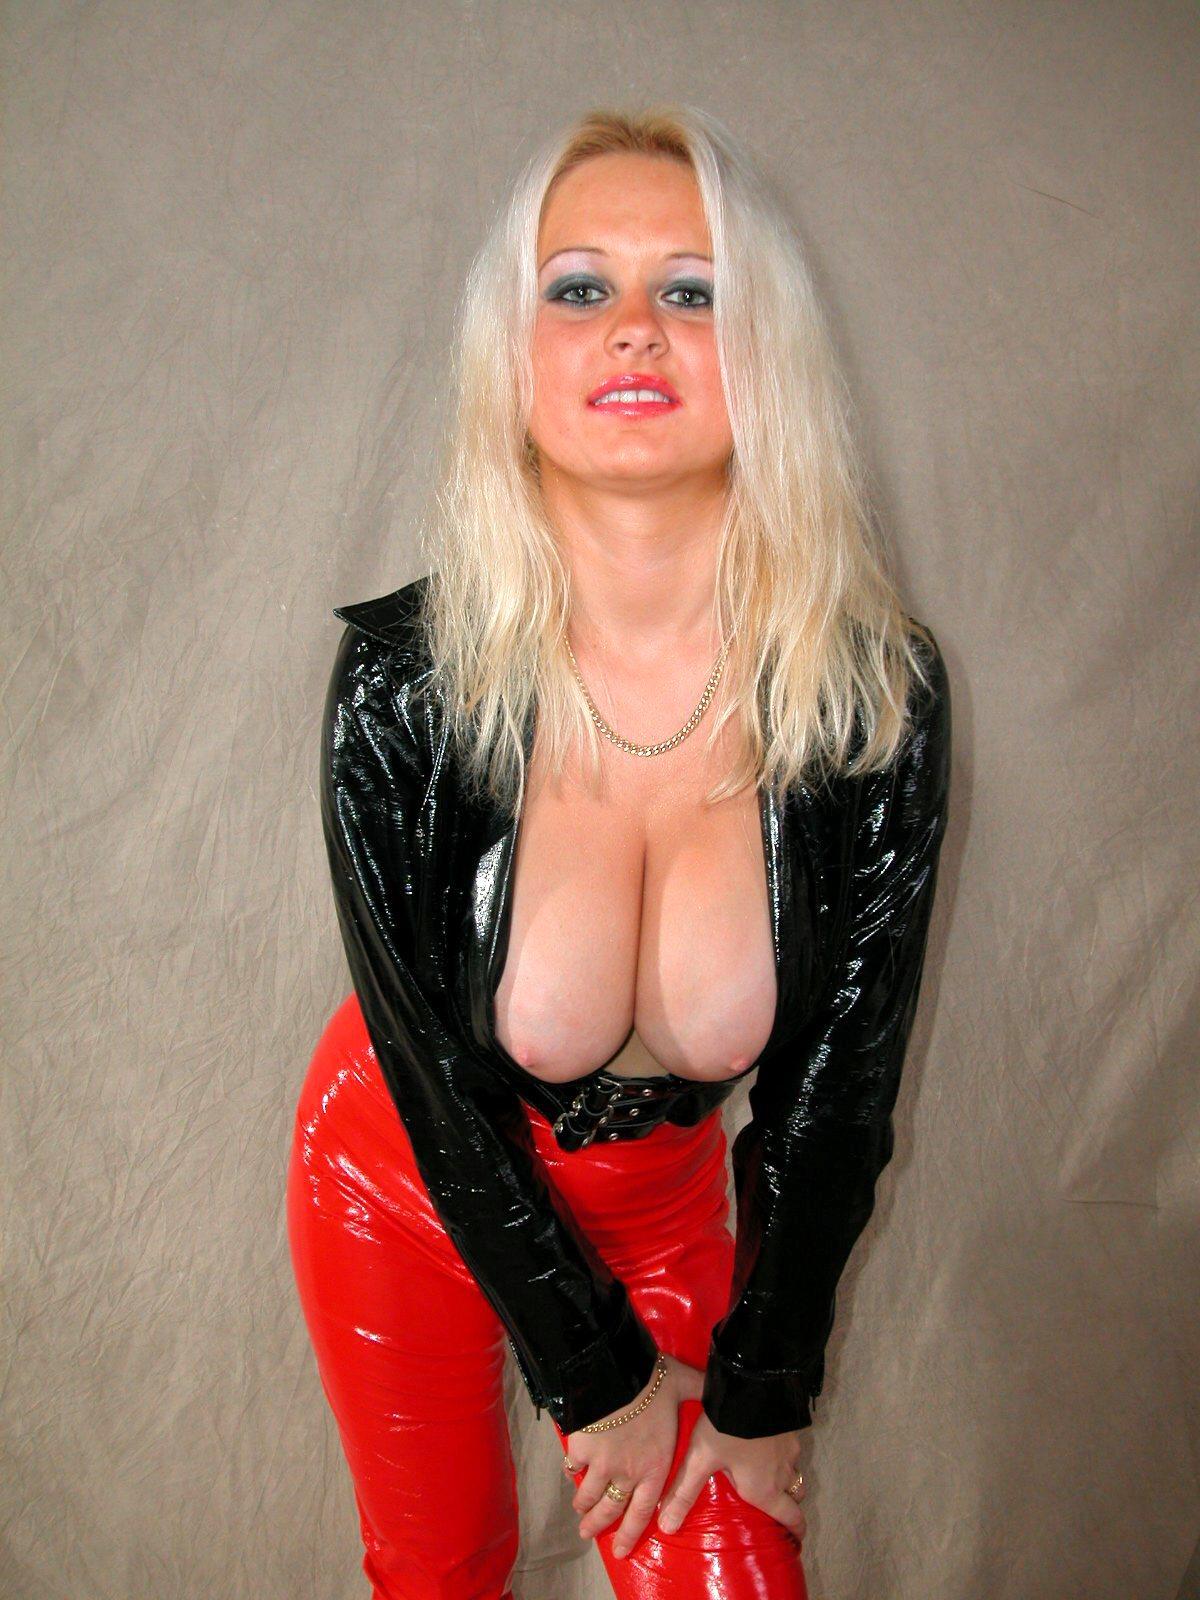 vollbusige Blondine